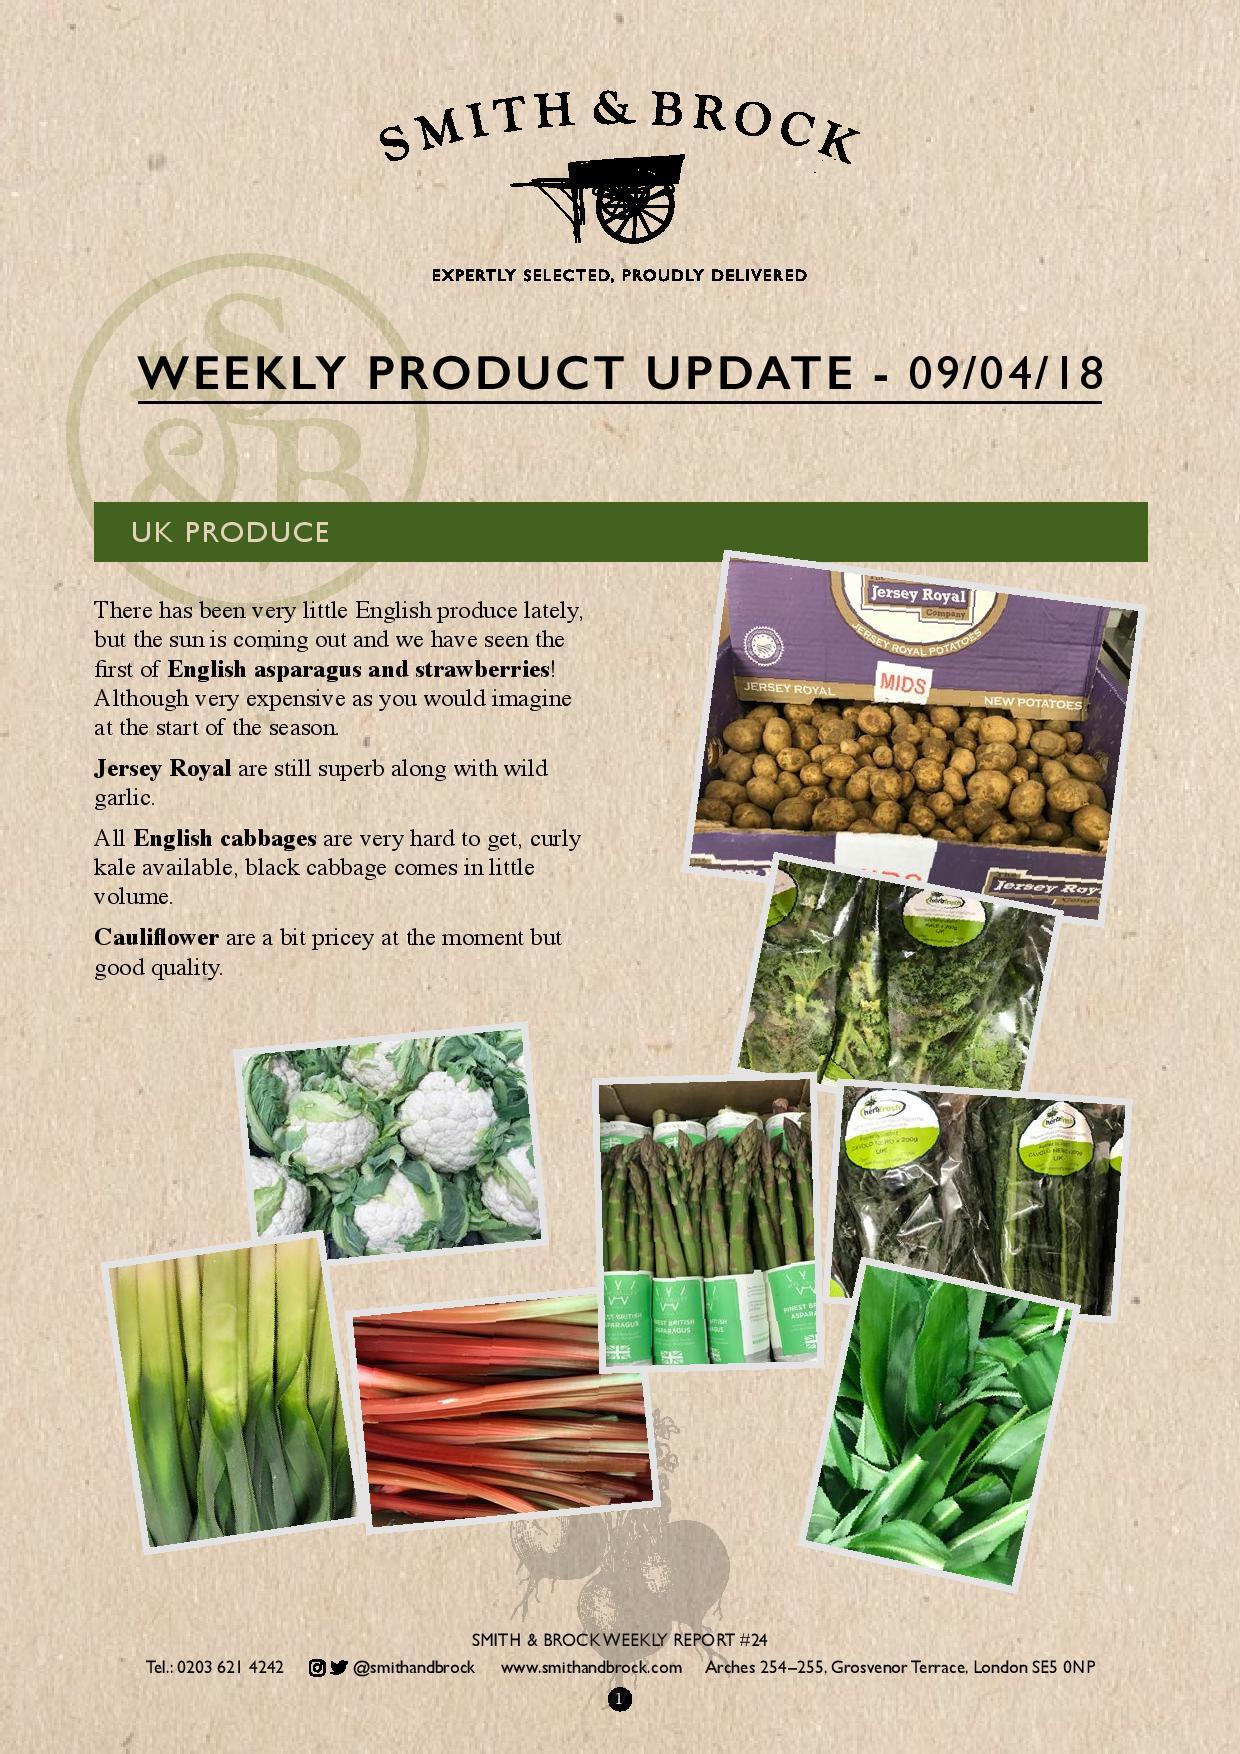 Smithandbrock_leeks_cauliflower_jerseyroyal_kale_asparagus